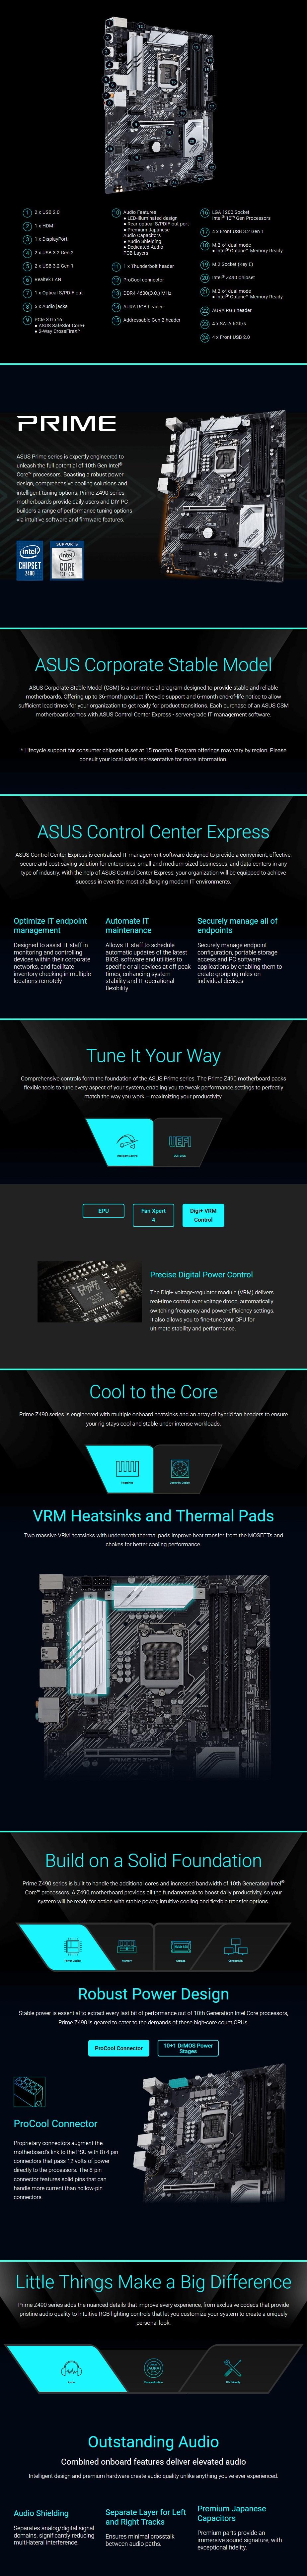 ASUS PRIME Z490-P/CSM Intel LGA 1200 ATX Motherboard - Overview 1